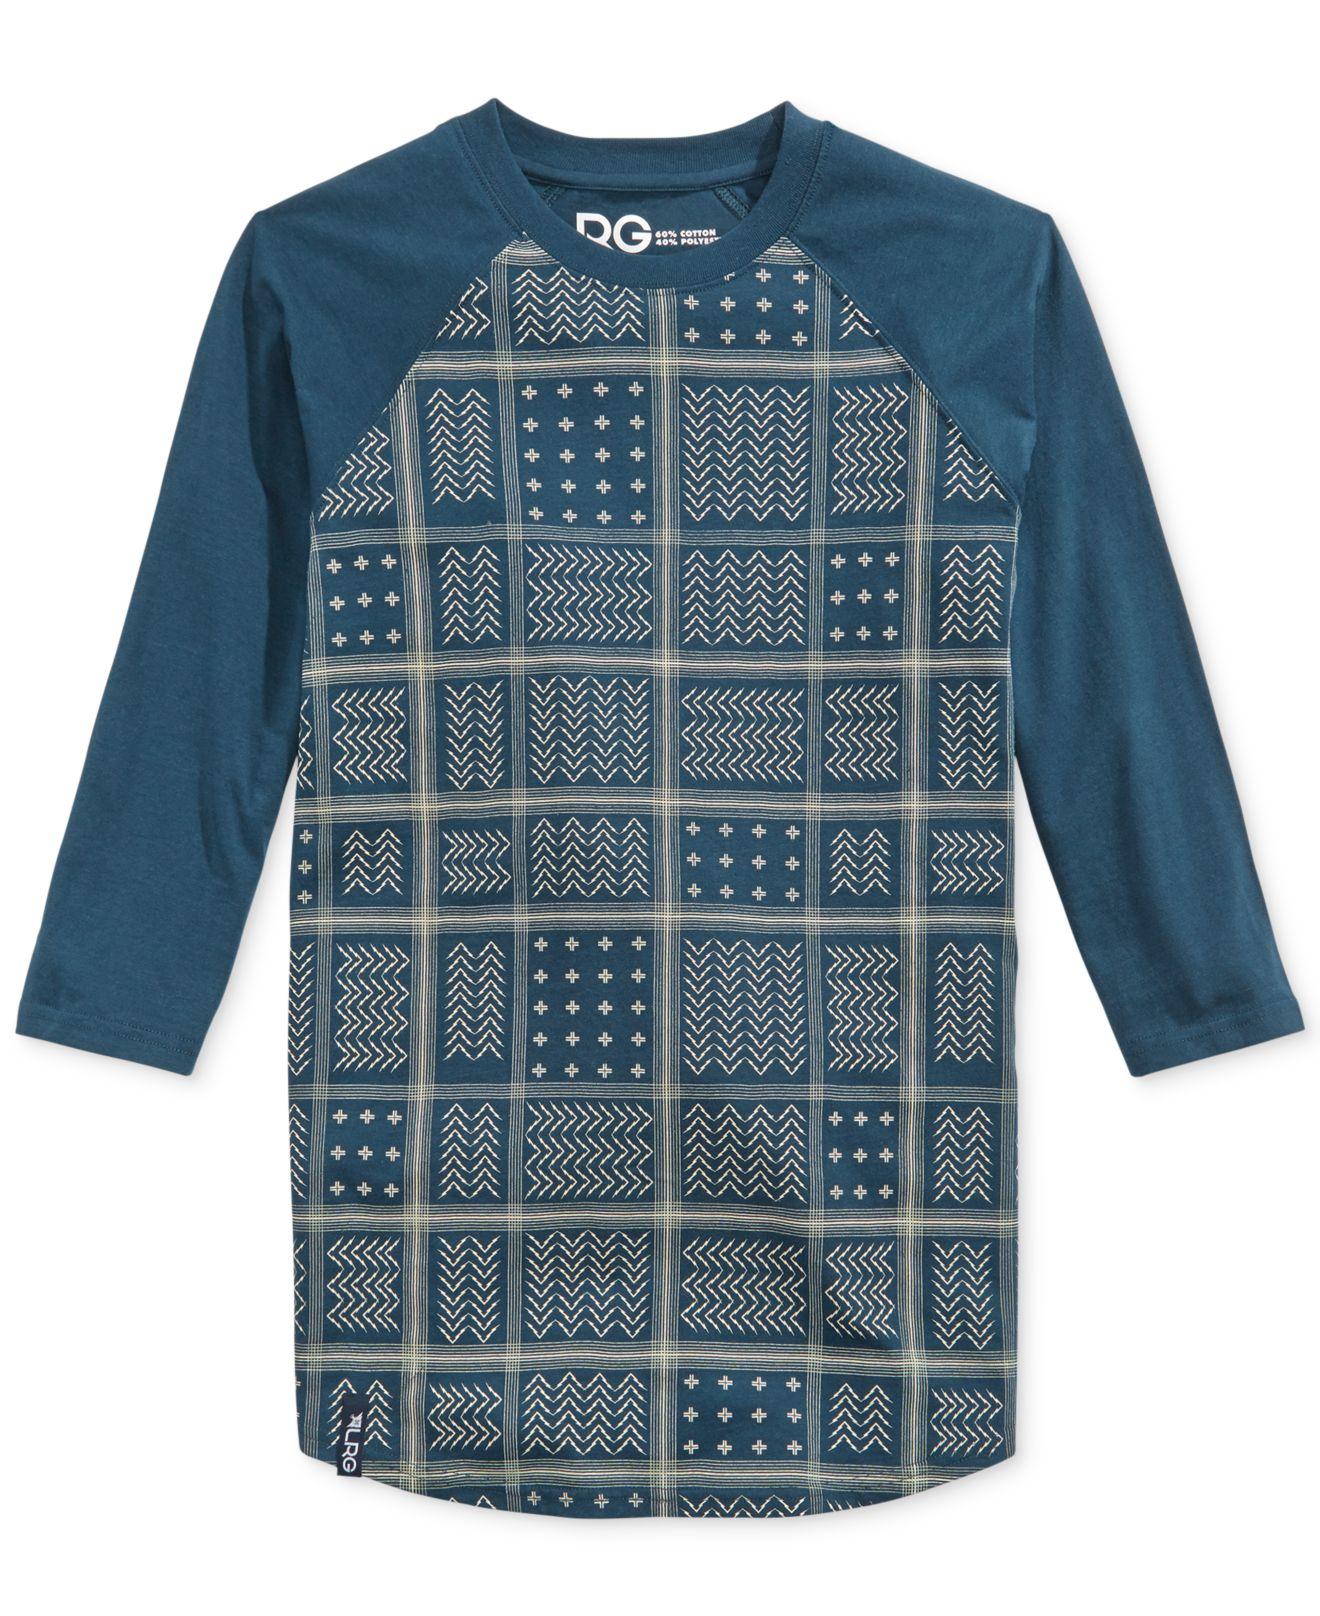 lrg bandana raglan t shirt in blue for men lyst. Black Bedroom Furniture Sets. Home Design Ideas